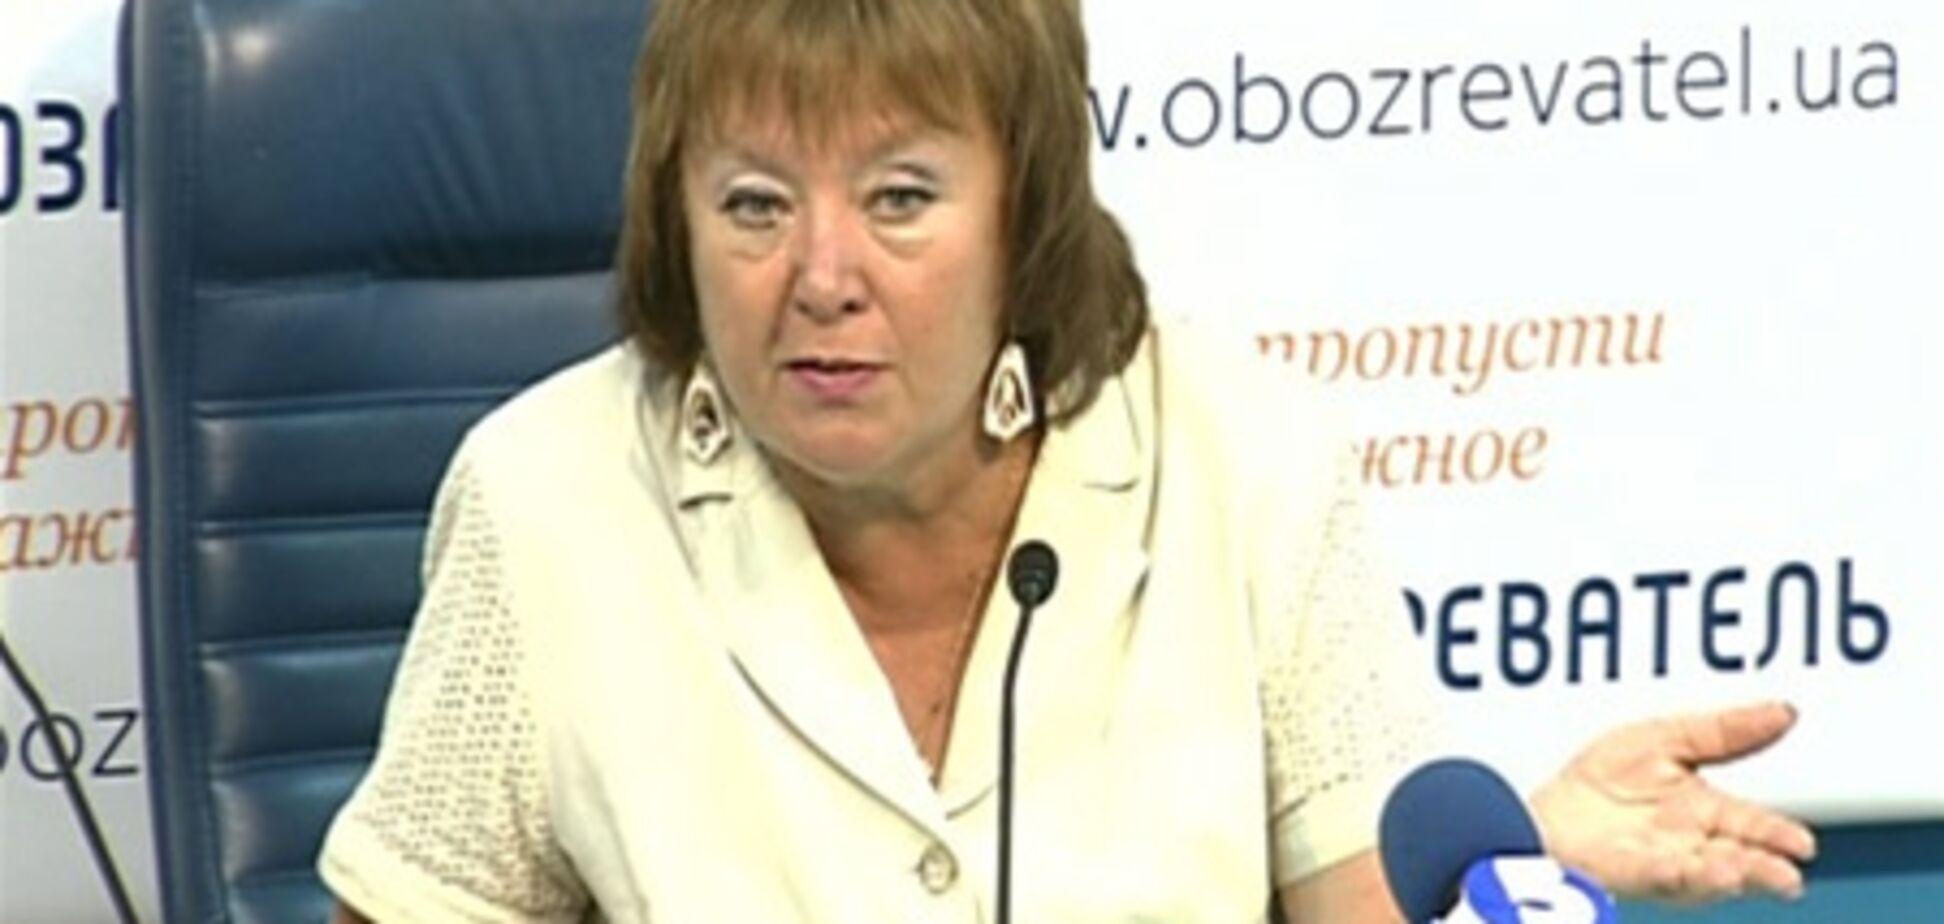 Витренко возмущена «судилищем» над Тимошенко